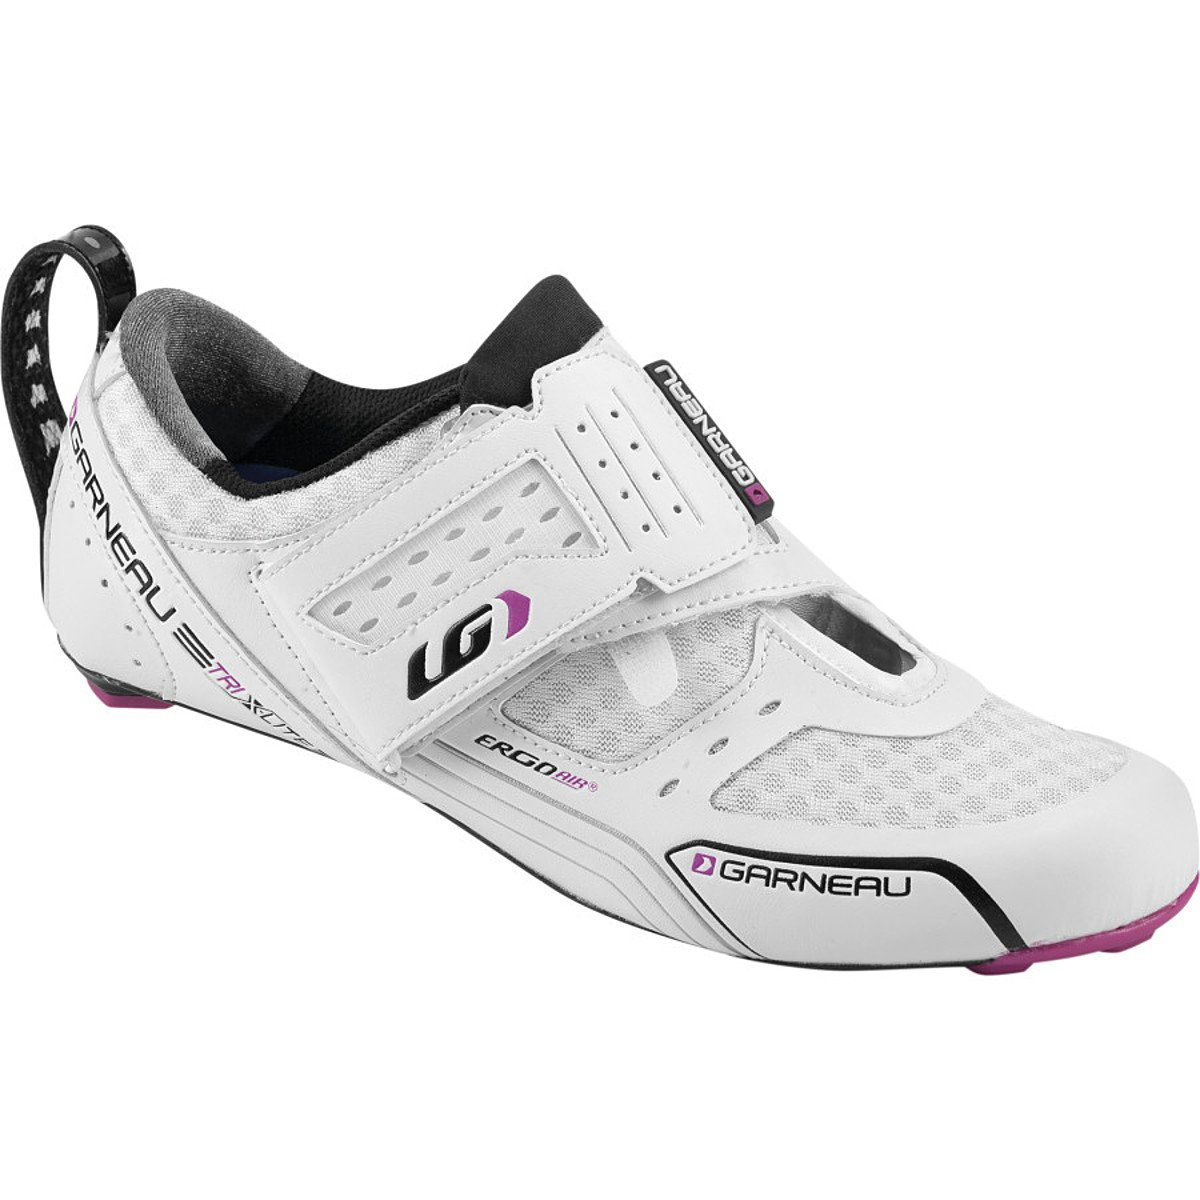 Louis Garneau Women s Tri-X-Lite Shoes White